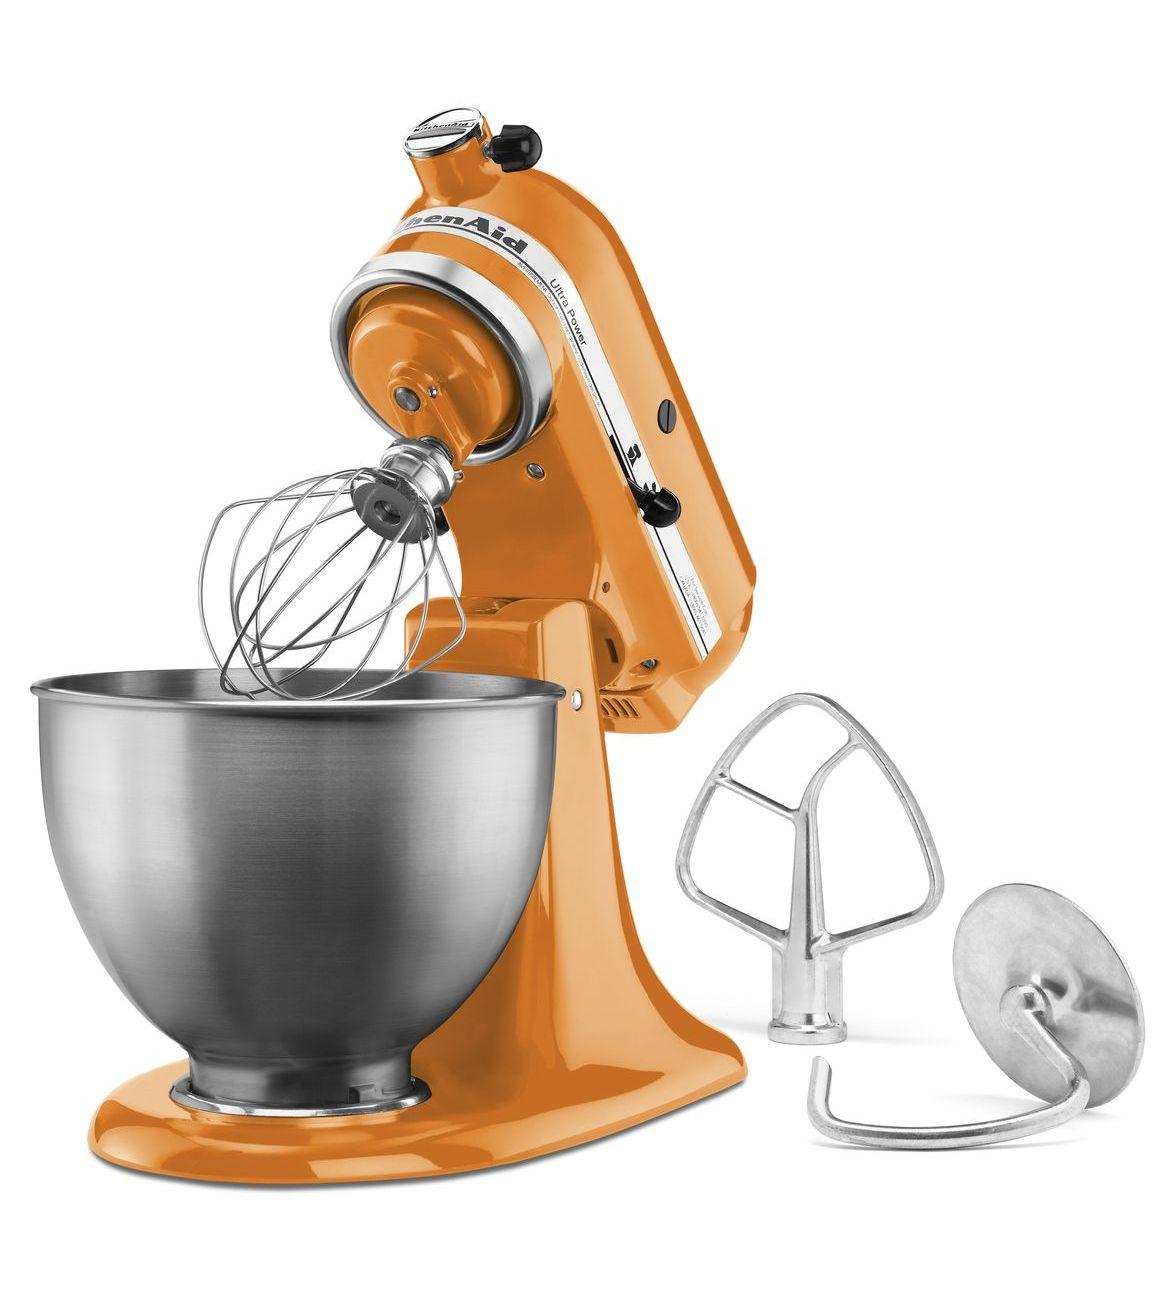 Kitchen aid ultra power mixer Photo - 11